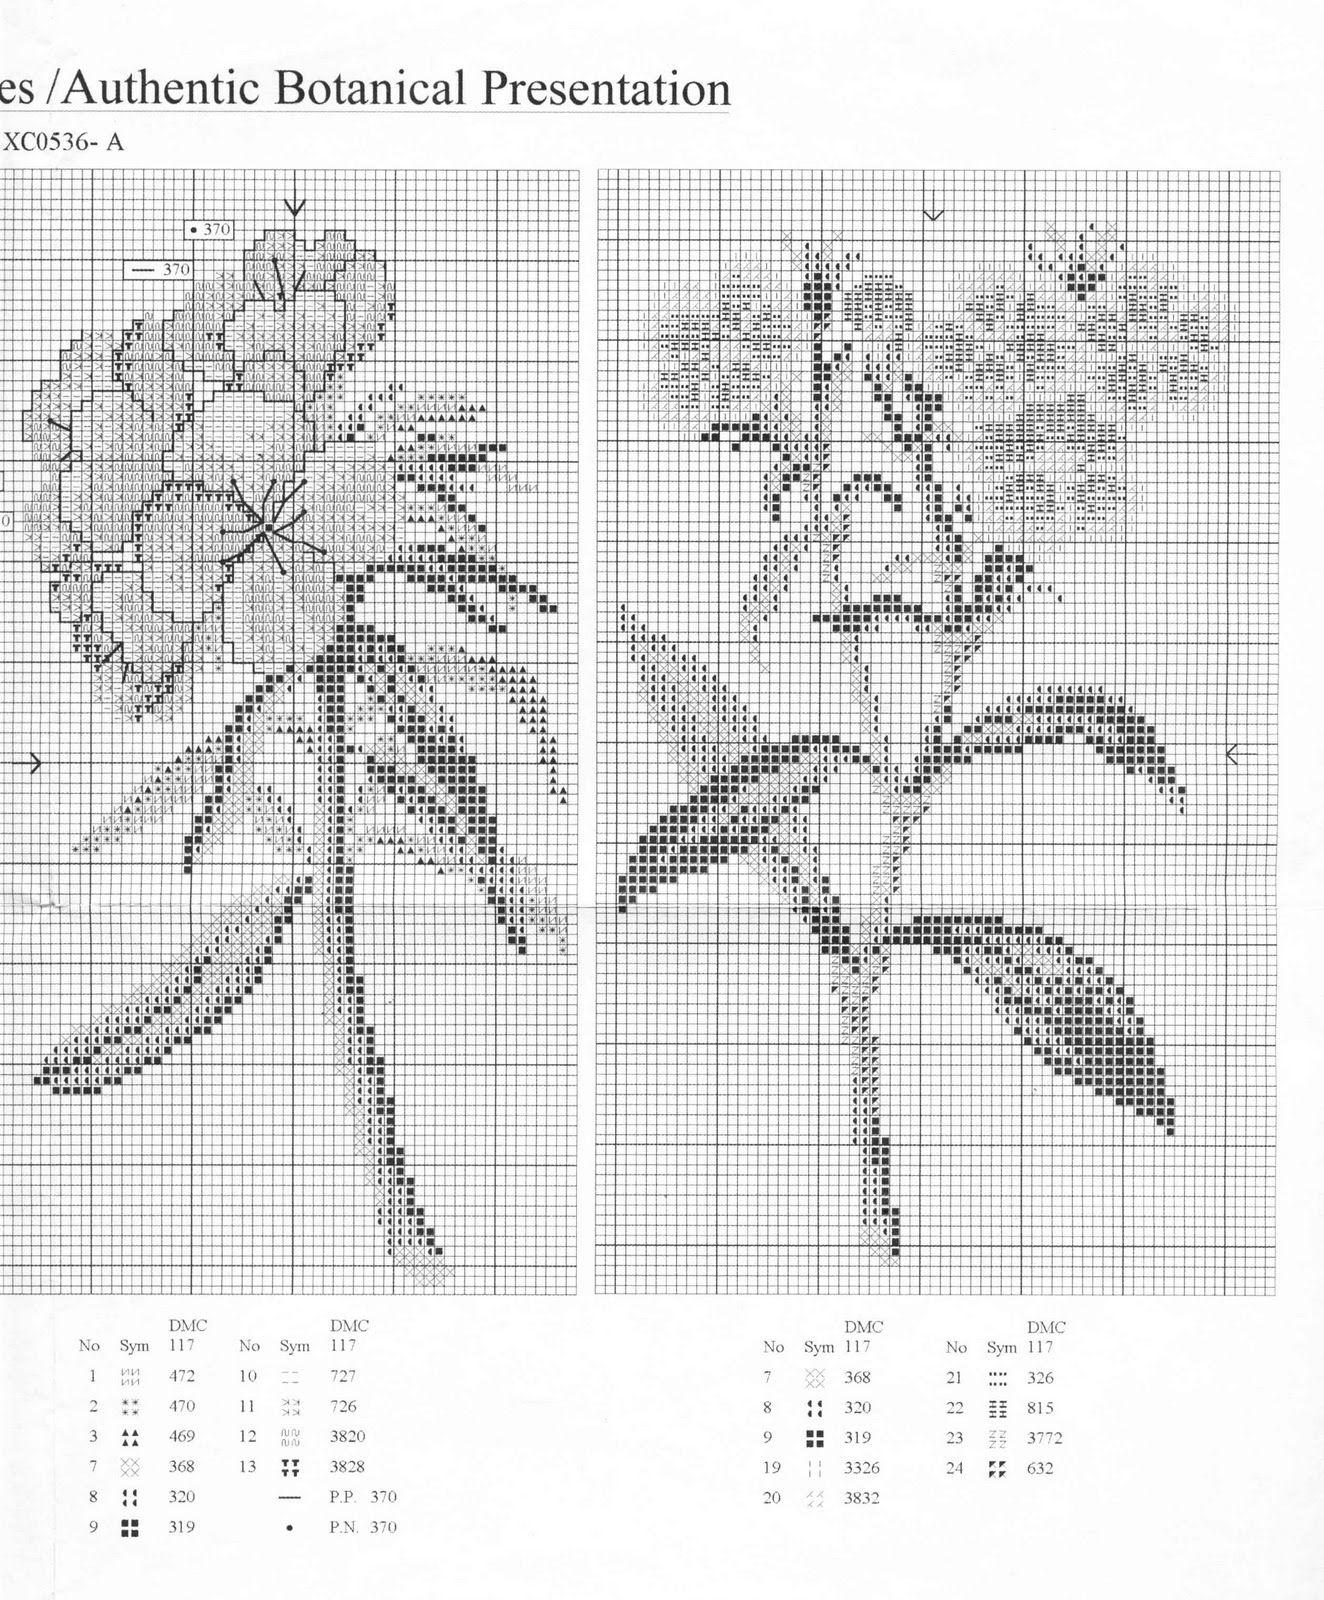 DMC+Botanical+2.jpg 1324×1600 pikseli